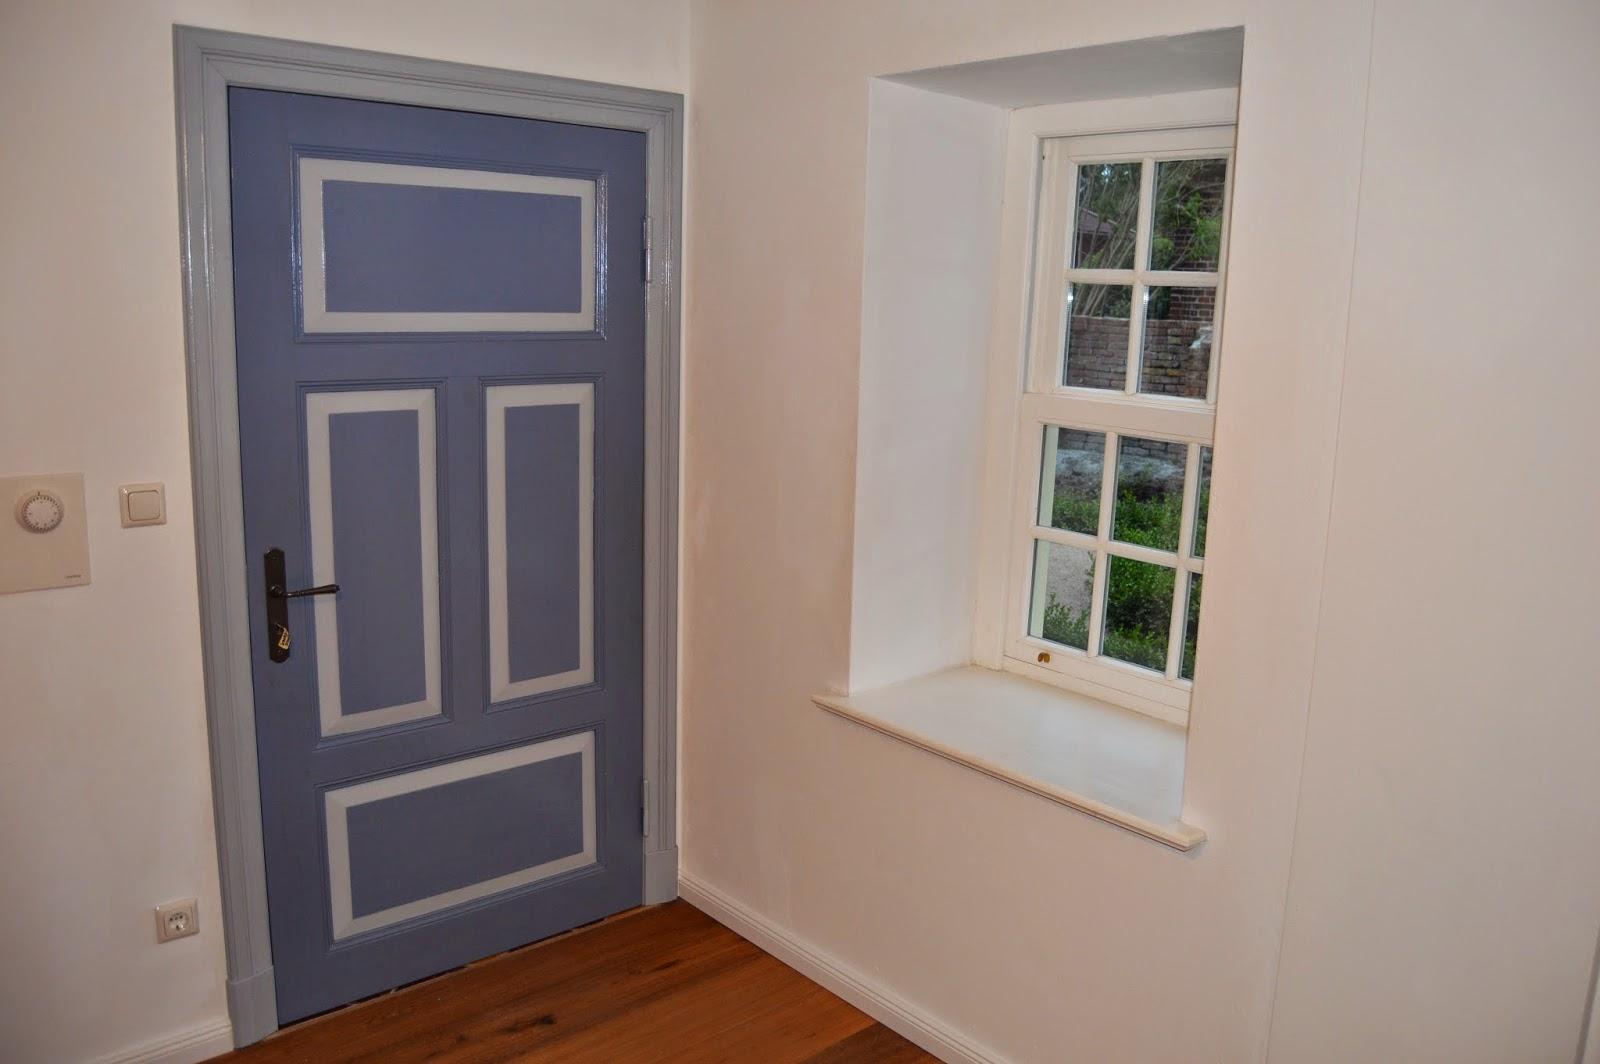 die alte b ckerei in westerhusen juni 2014. Black Bedroom Furniture Sets. Home Design Ideas